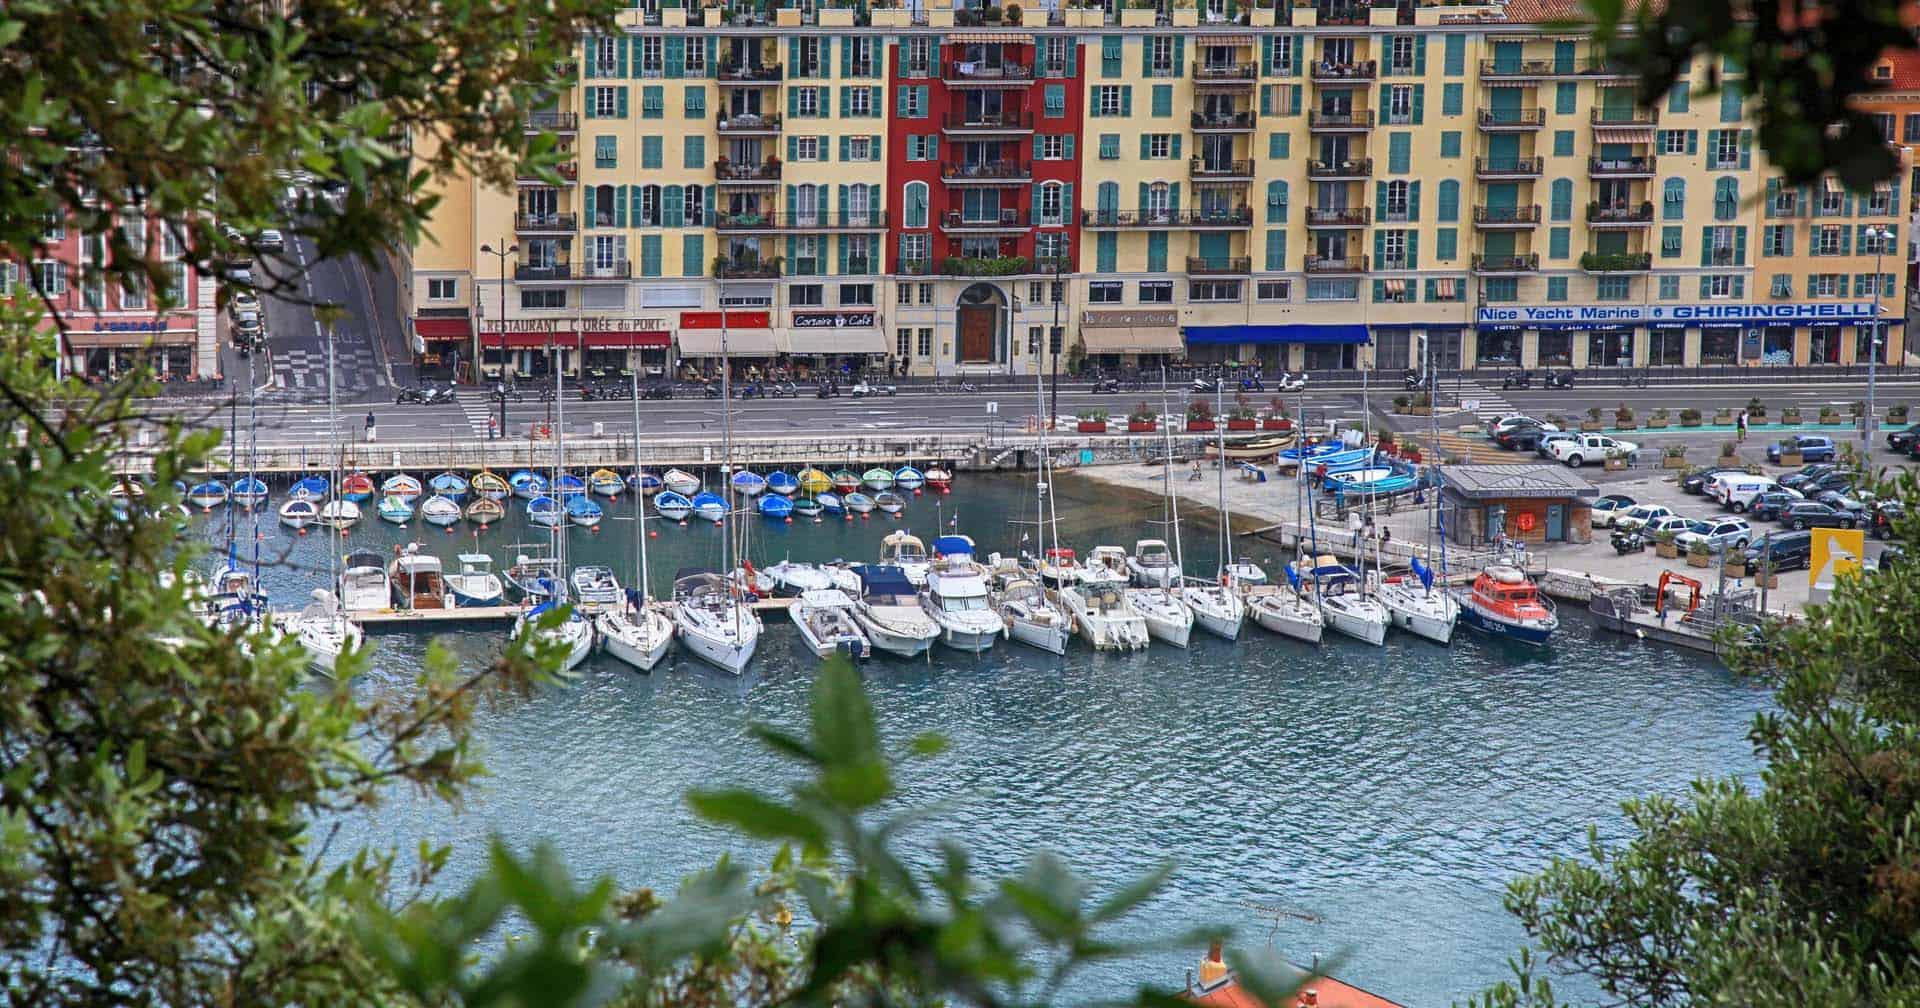 Top 10 Best Day Trips from Monaco